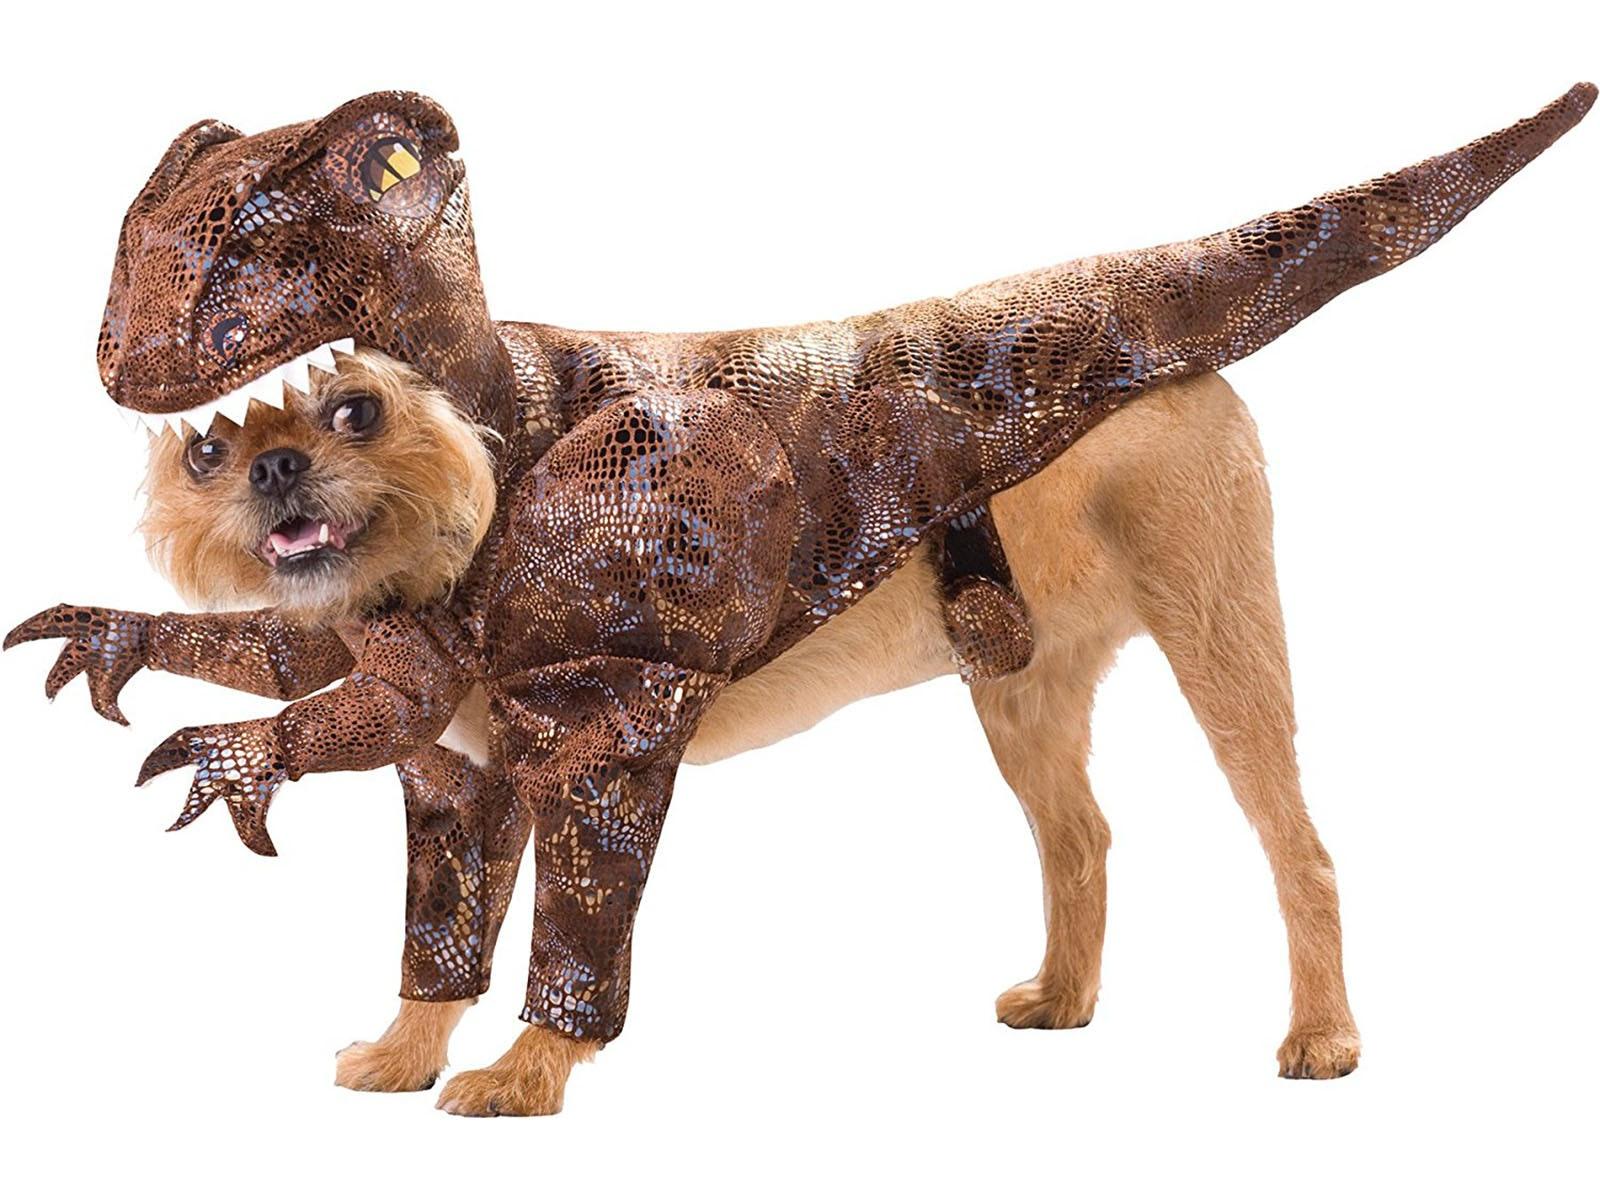 This amazing dinosaur costume